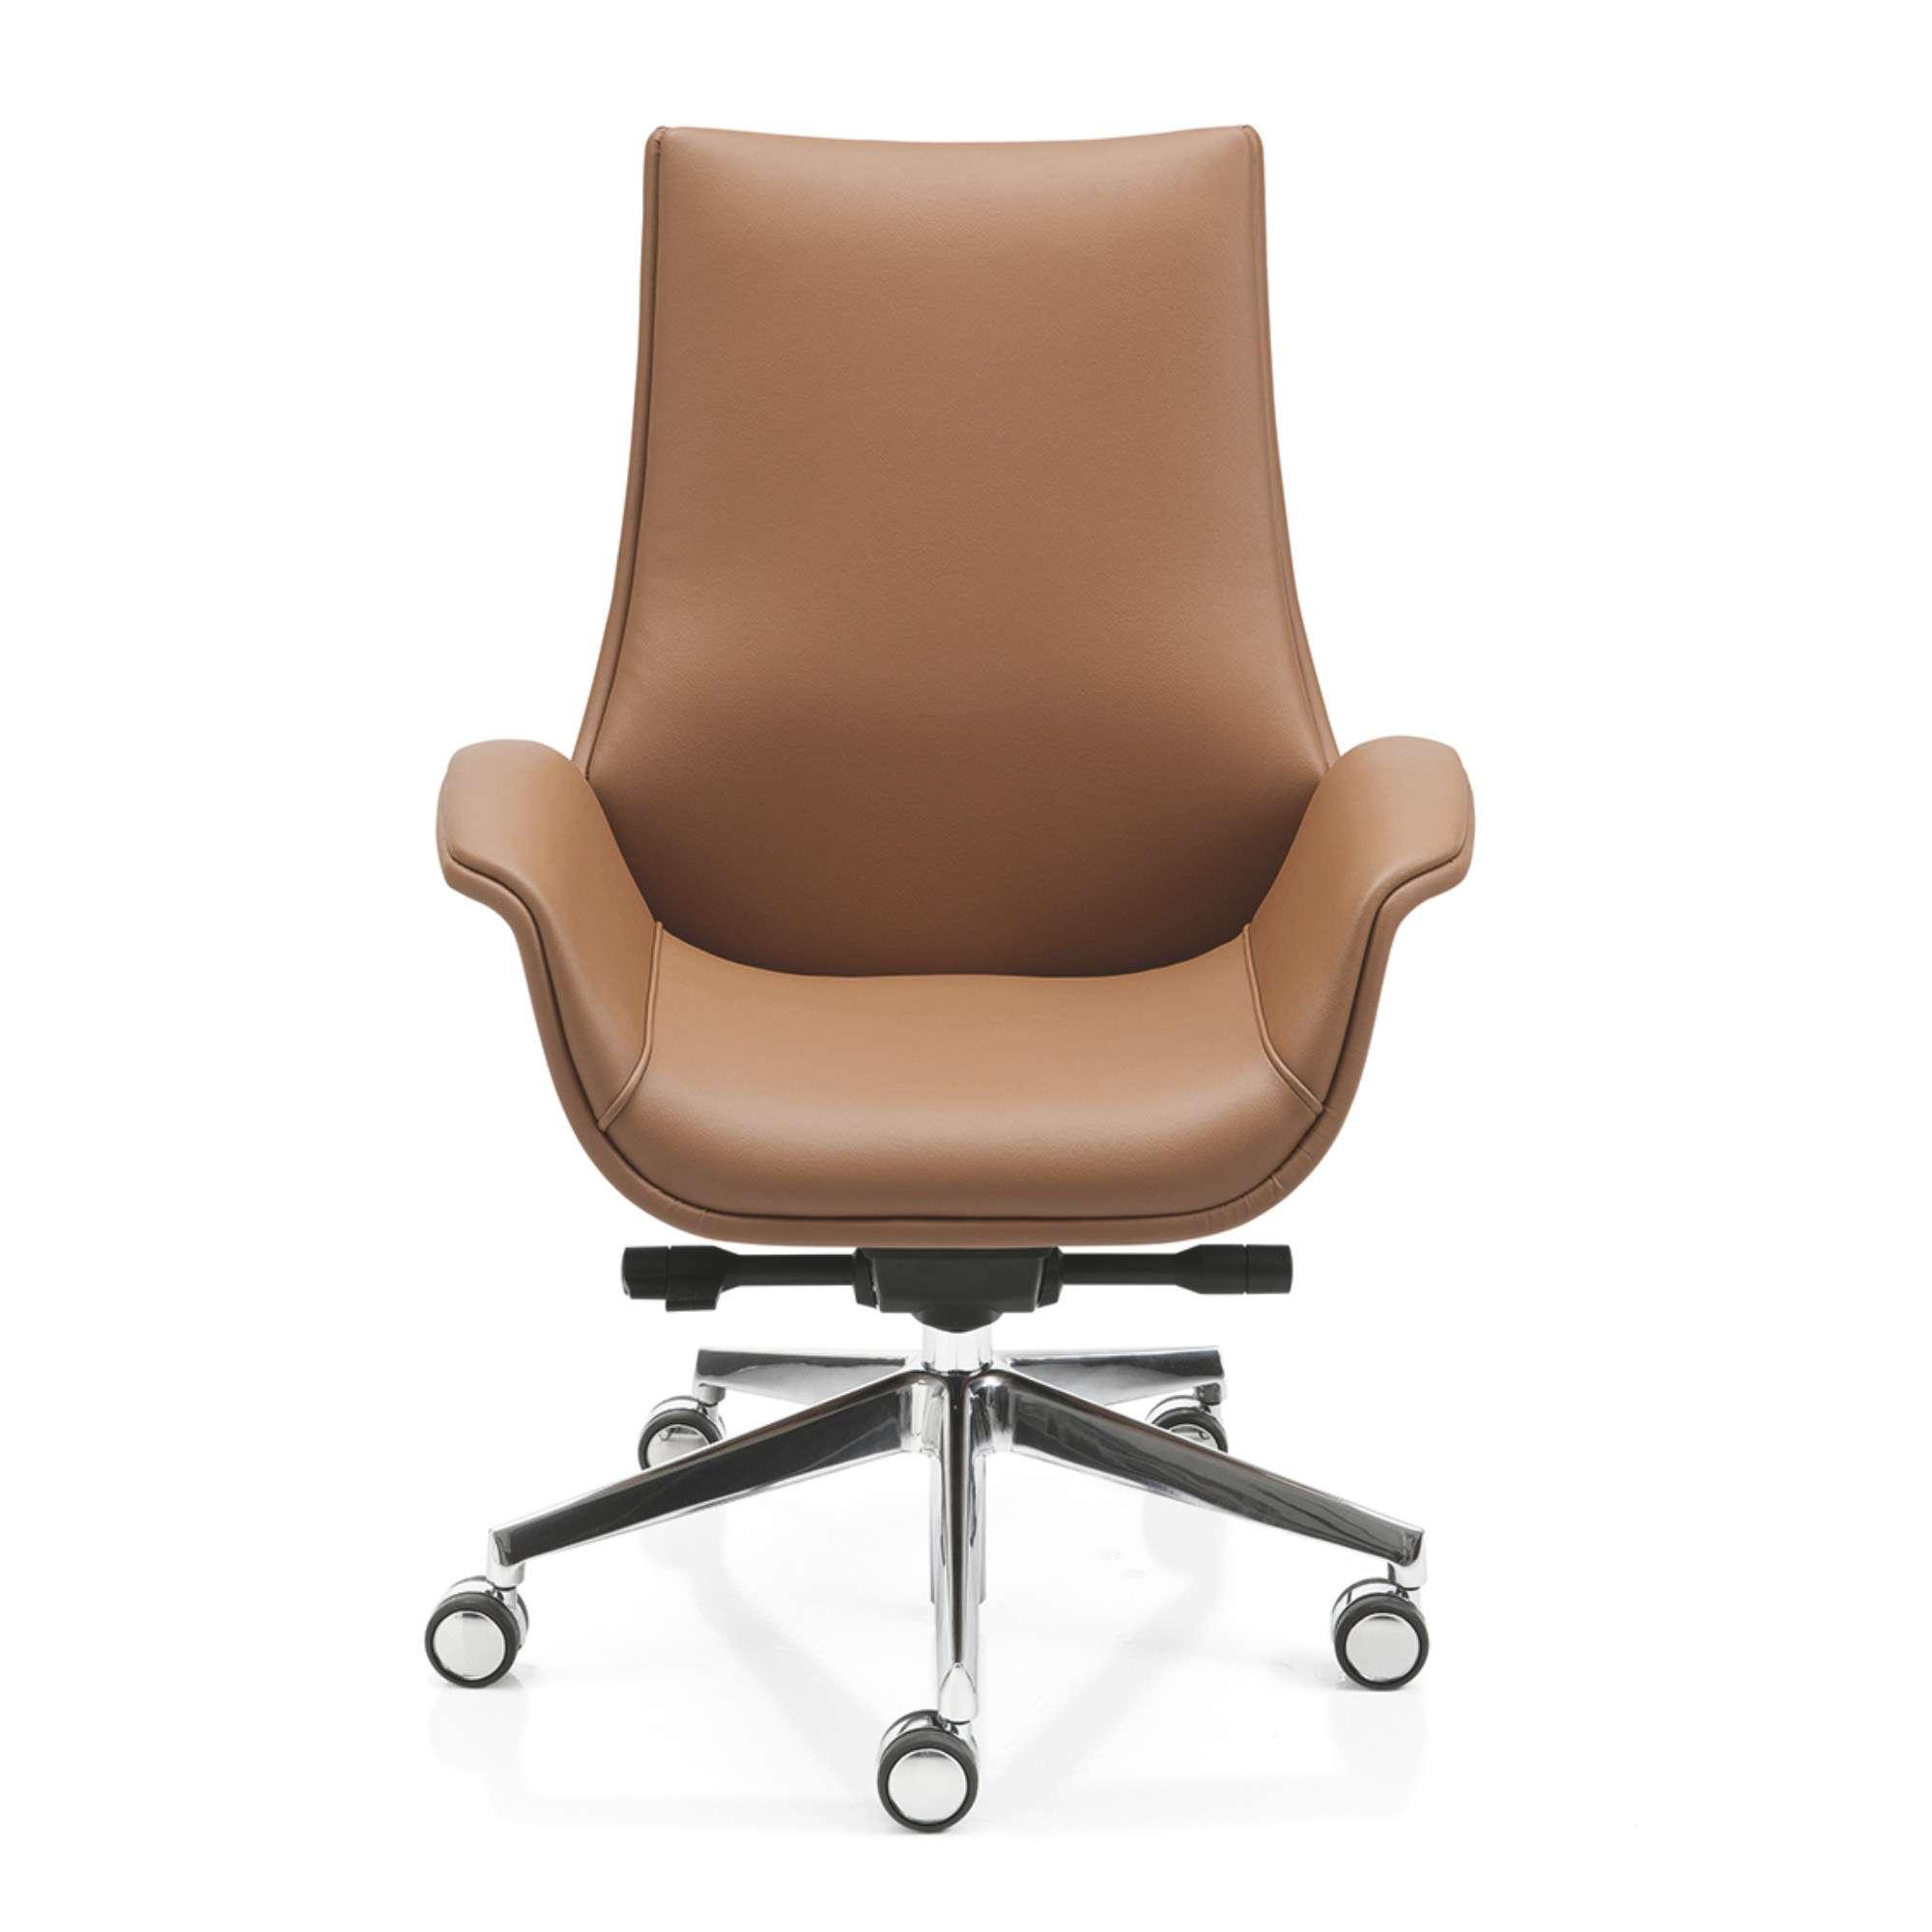 Designer Büromöbel aus Italien | Büromöbel günstig online bestellen